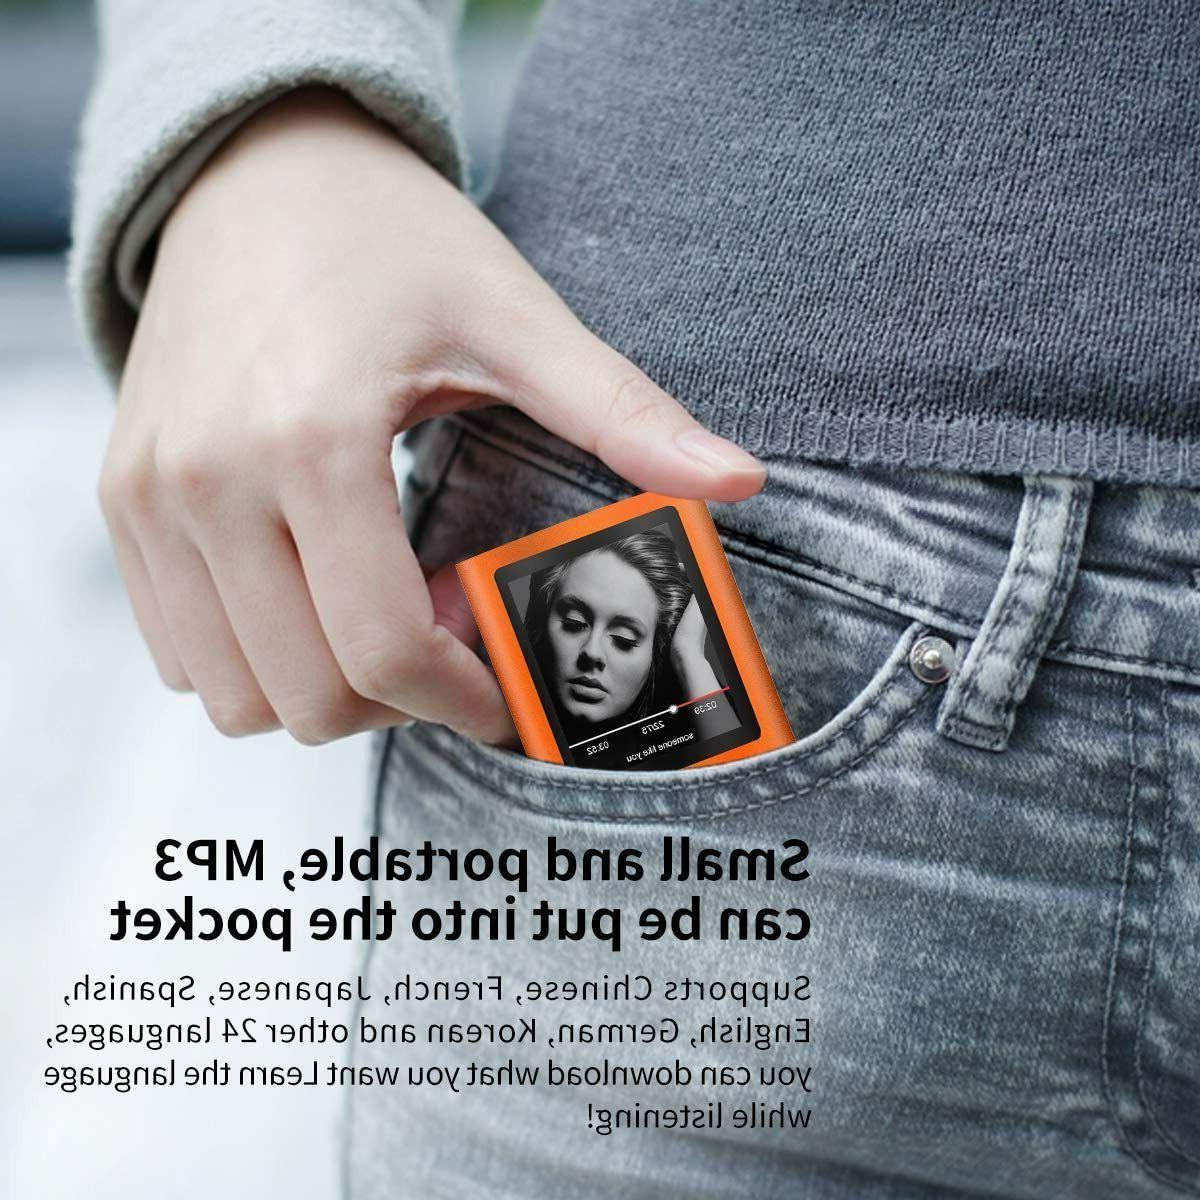 MYMAHDI / 32GB Memory Card, Screen Or